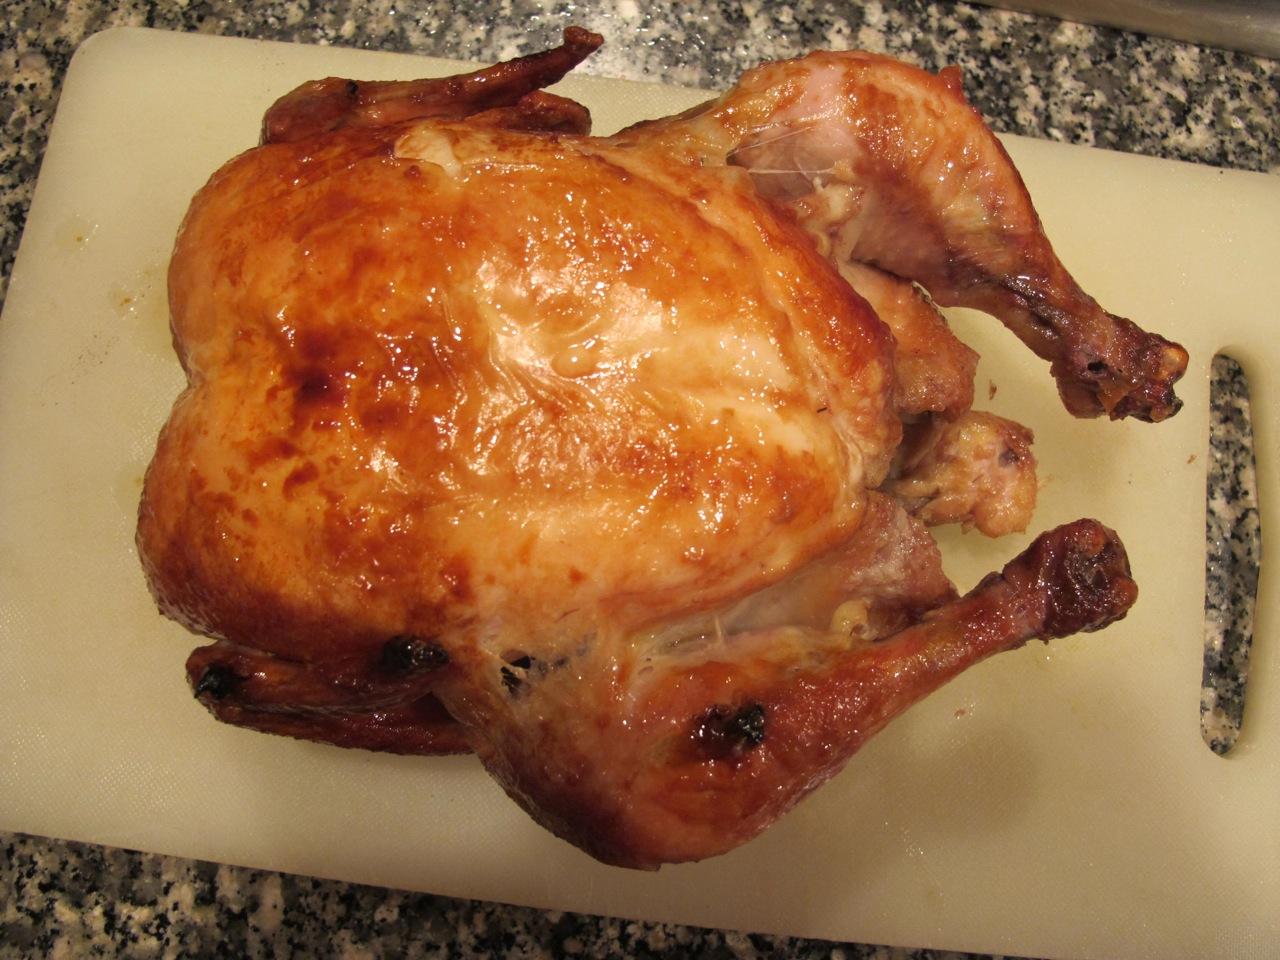 Simple Roast Chicken via Anthony Bourdain and Thomas Keller